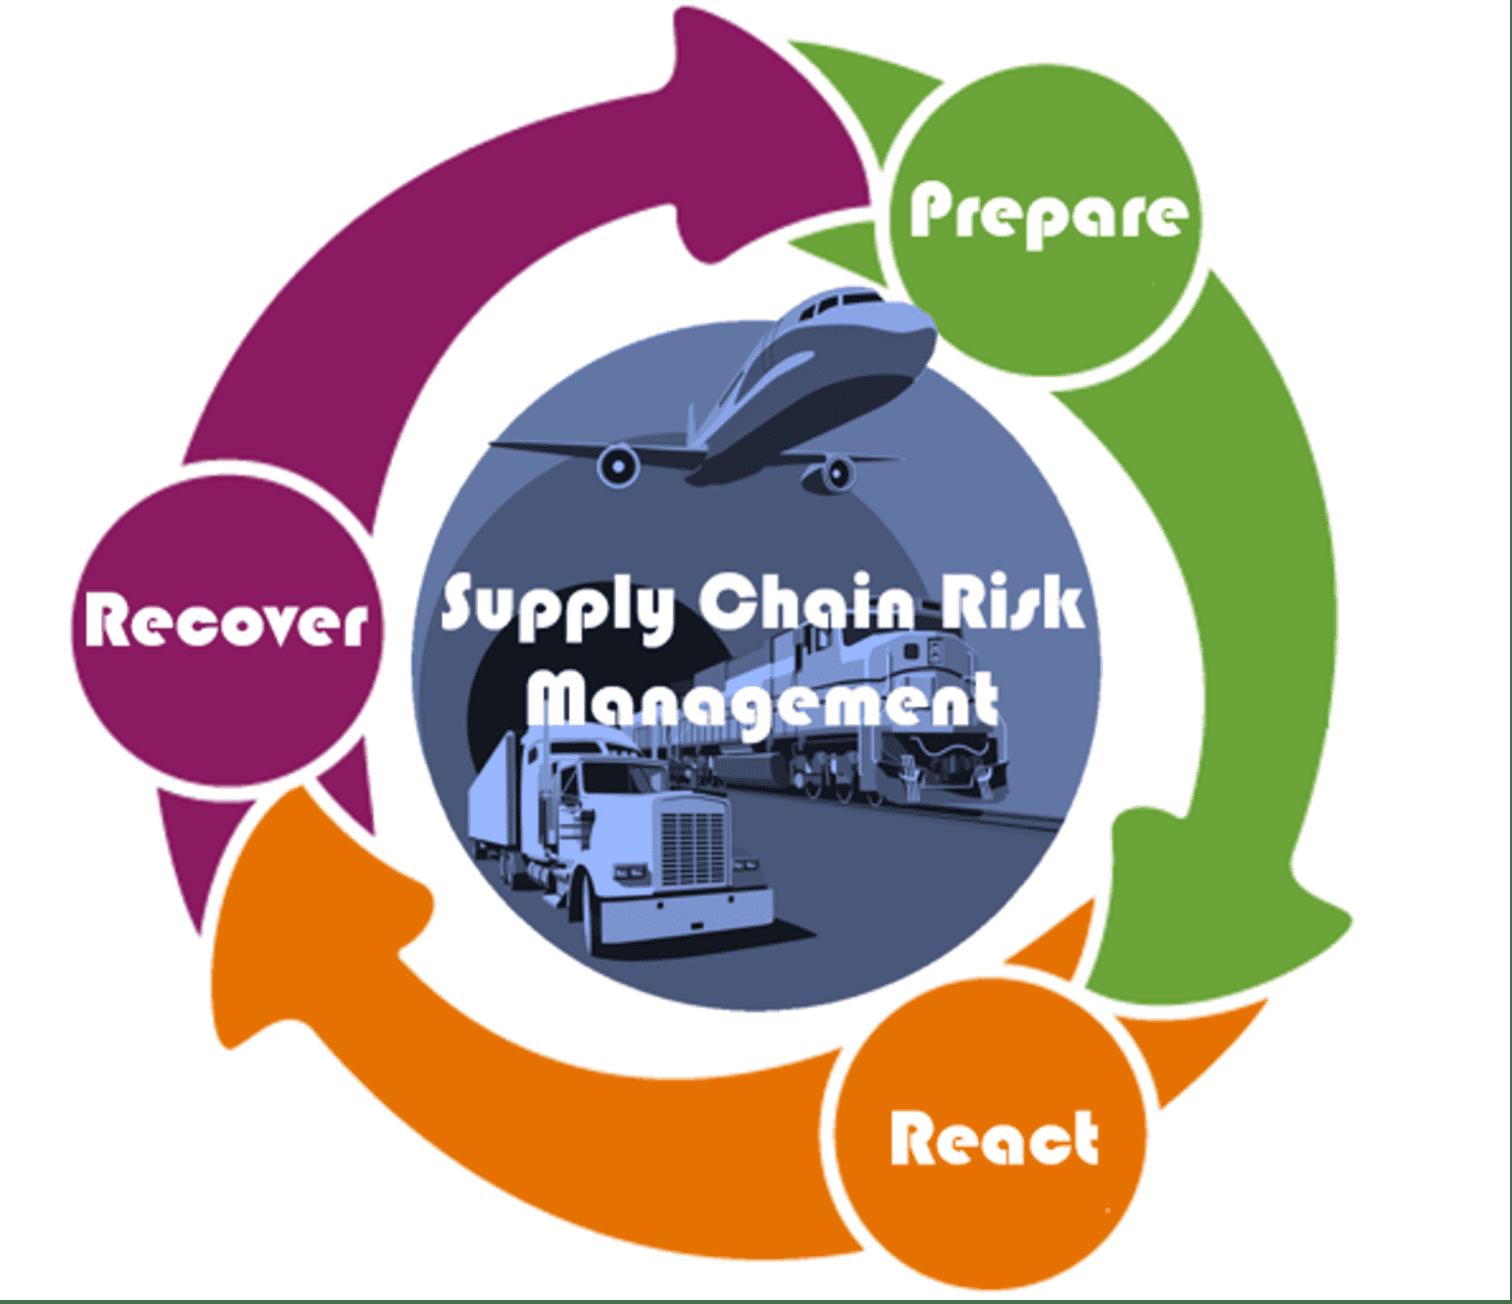 Supply Chain Risk Management diagram